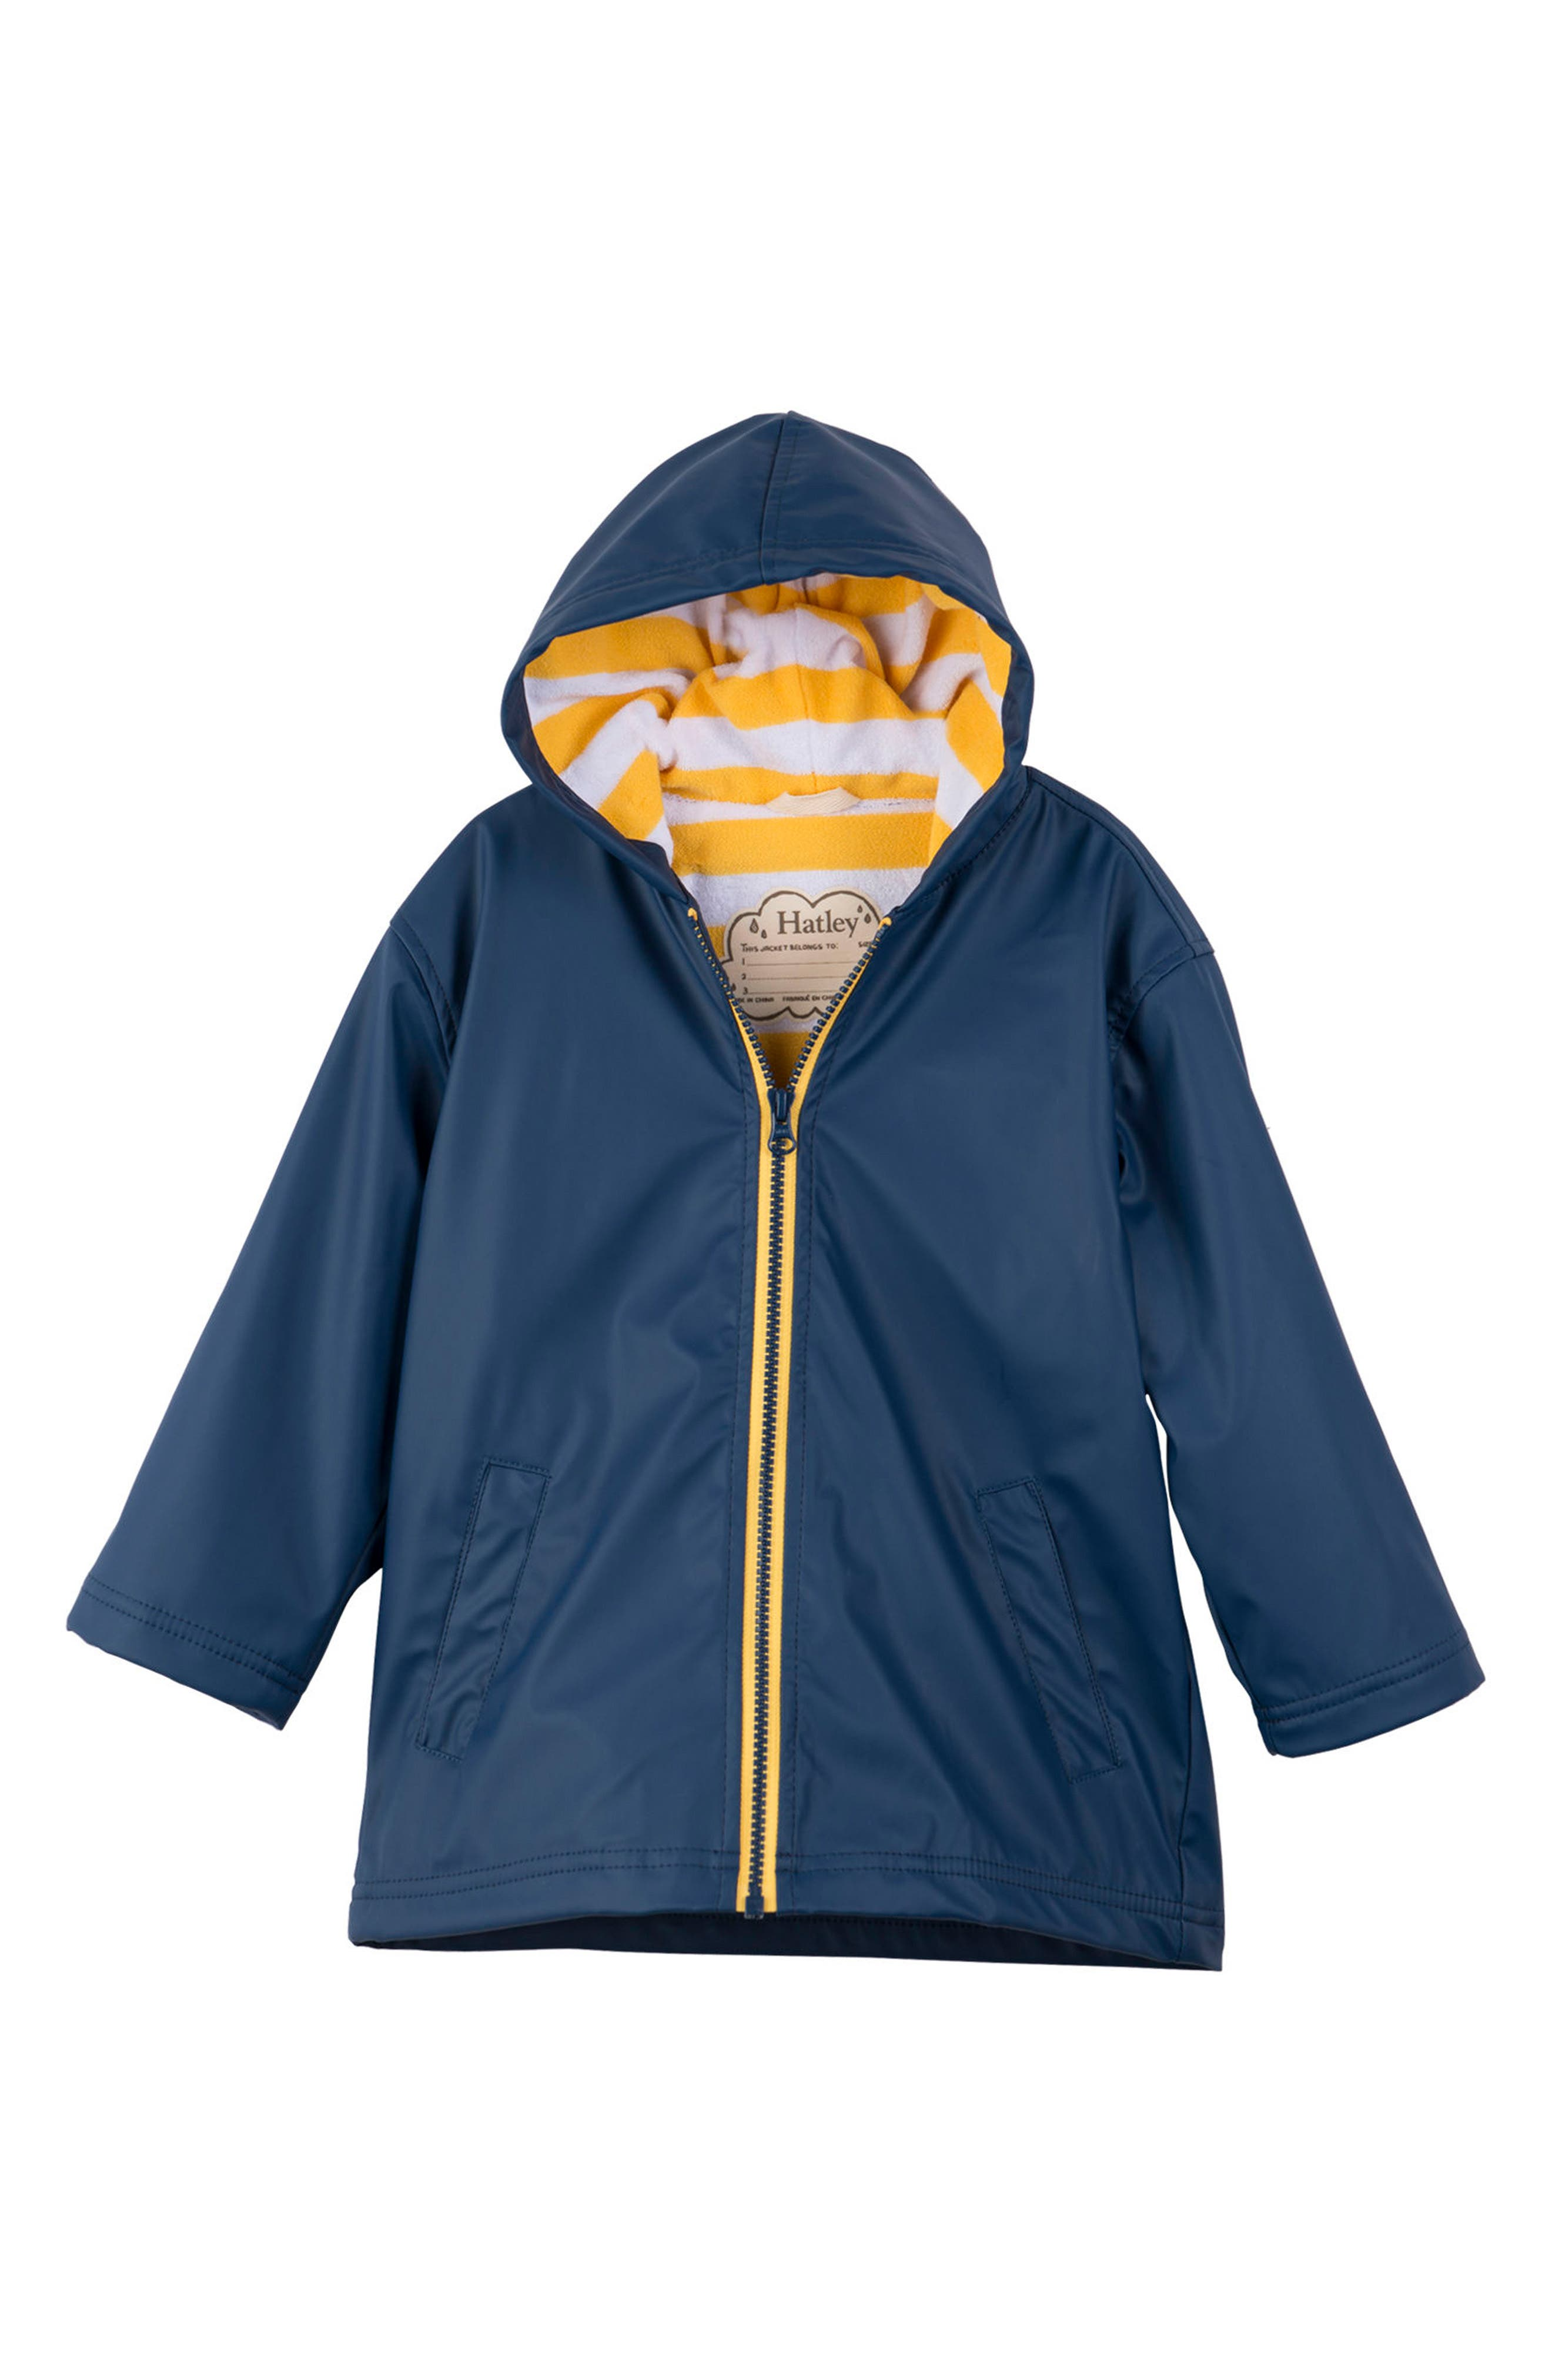 HATLEY, Splash Hooded Raincoat, Main thumbnail 1, color, NAVY/ YELLOW